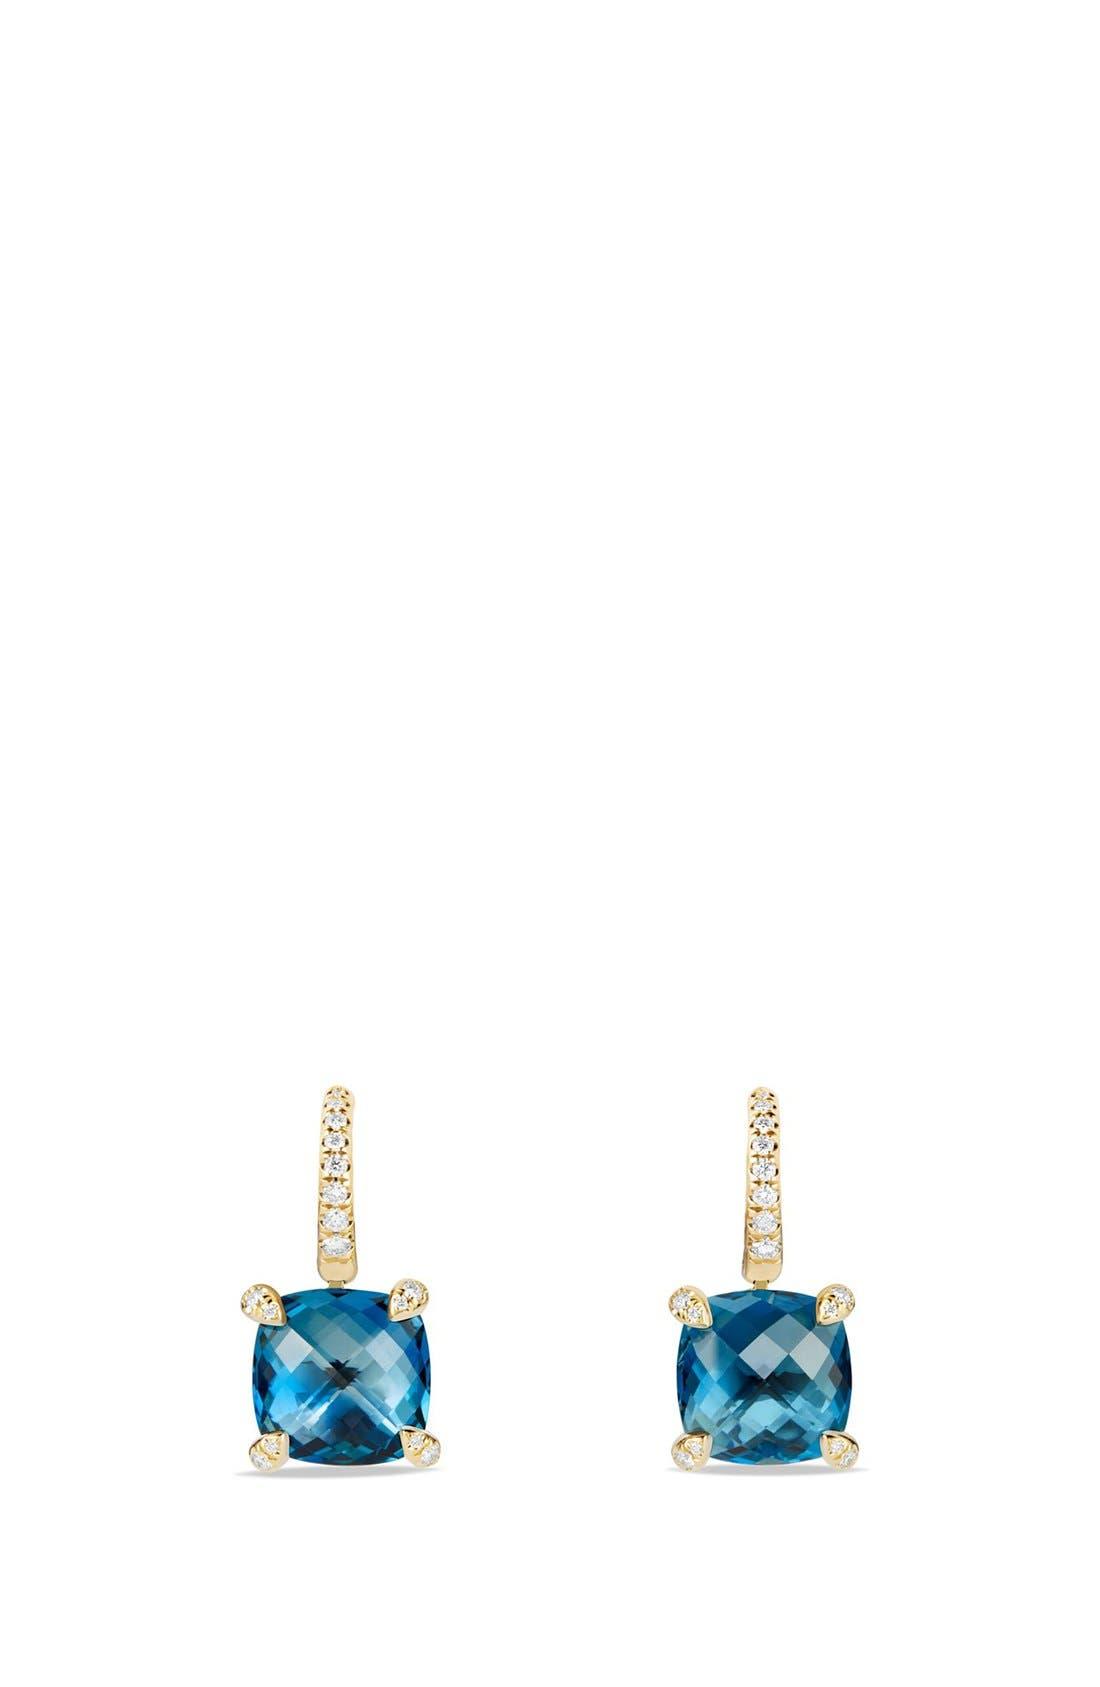 'Chatelaine' Hampton Blue Topaz and Diamonds in 18K Gold,                             Main thumbnail 1, color,                             400